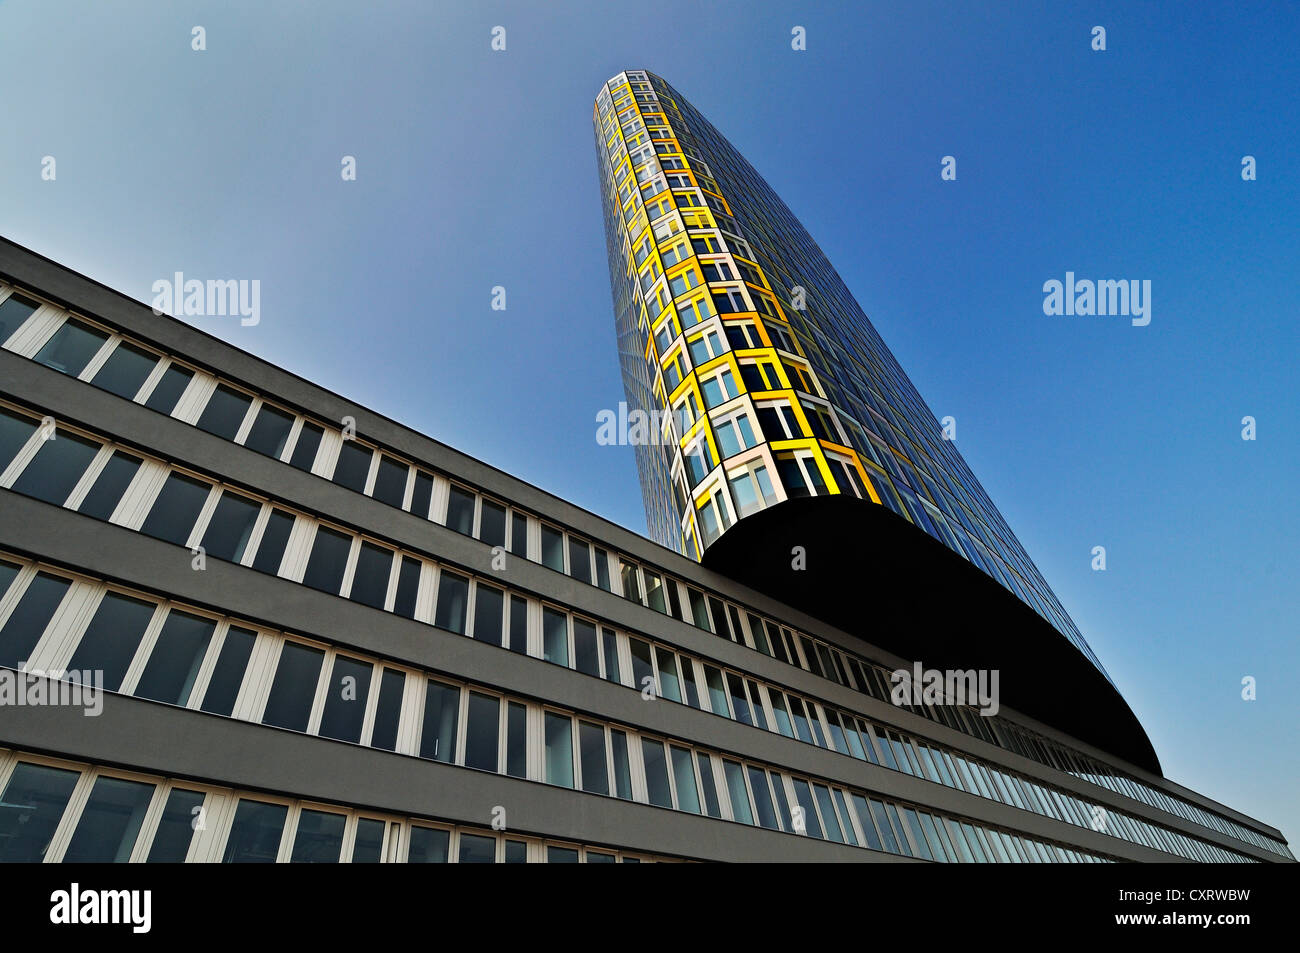 The new ADAC headquarters, German automobile club, Hansastrasse street 23-25, Munich, Bavaria, Germany, Europe - Stock Image